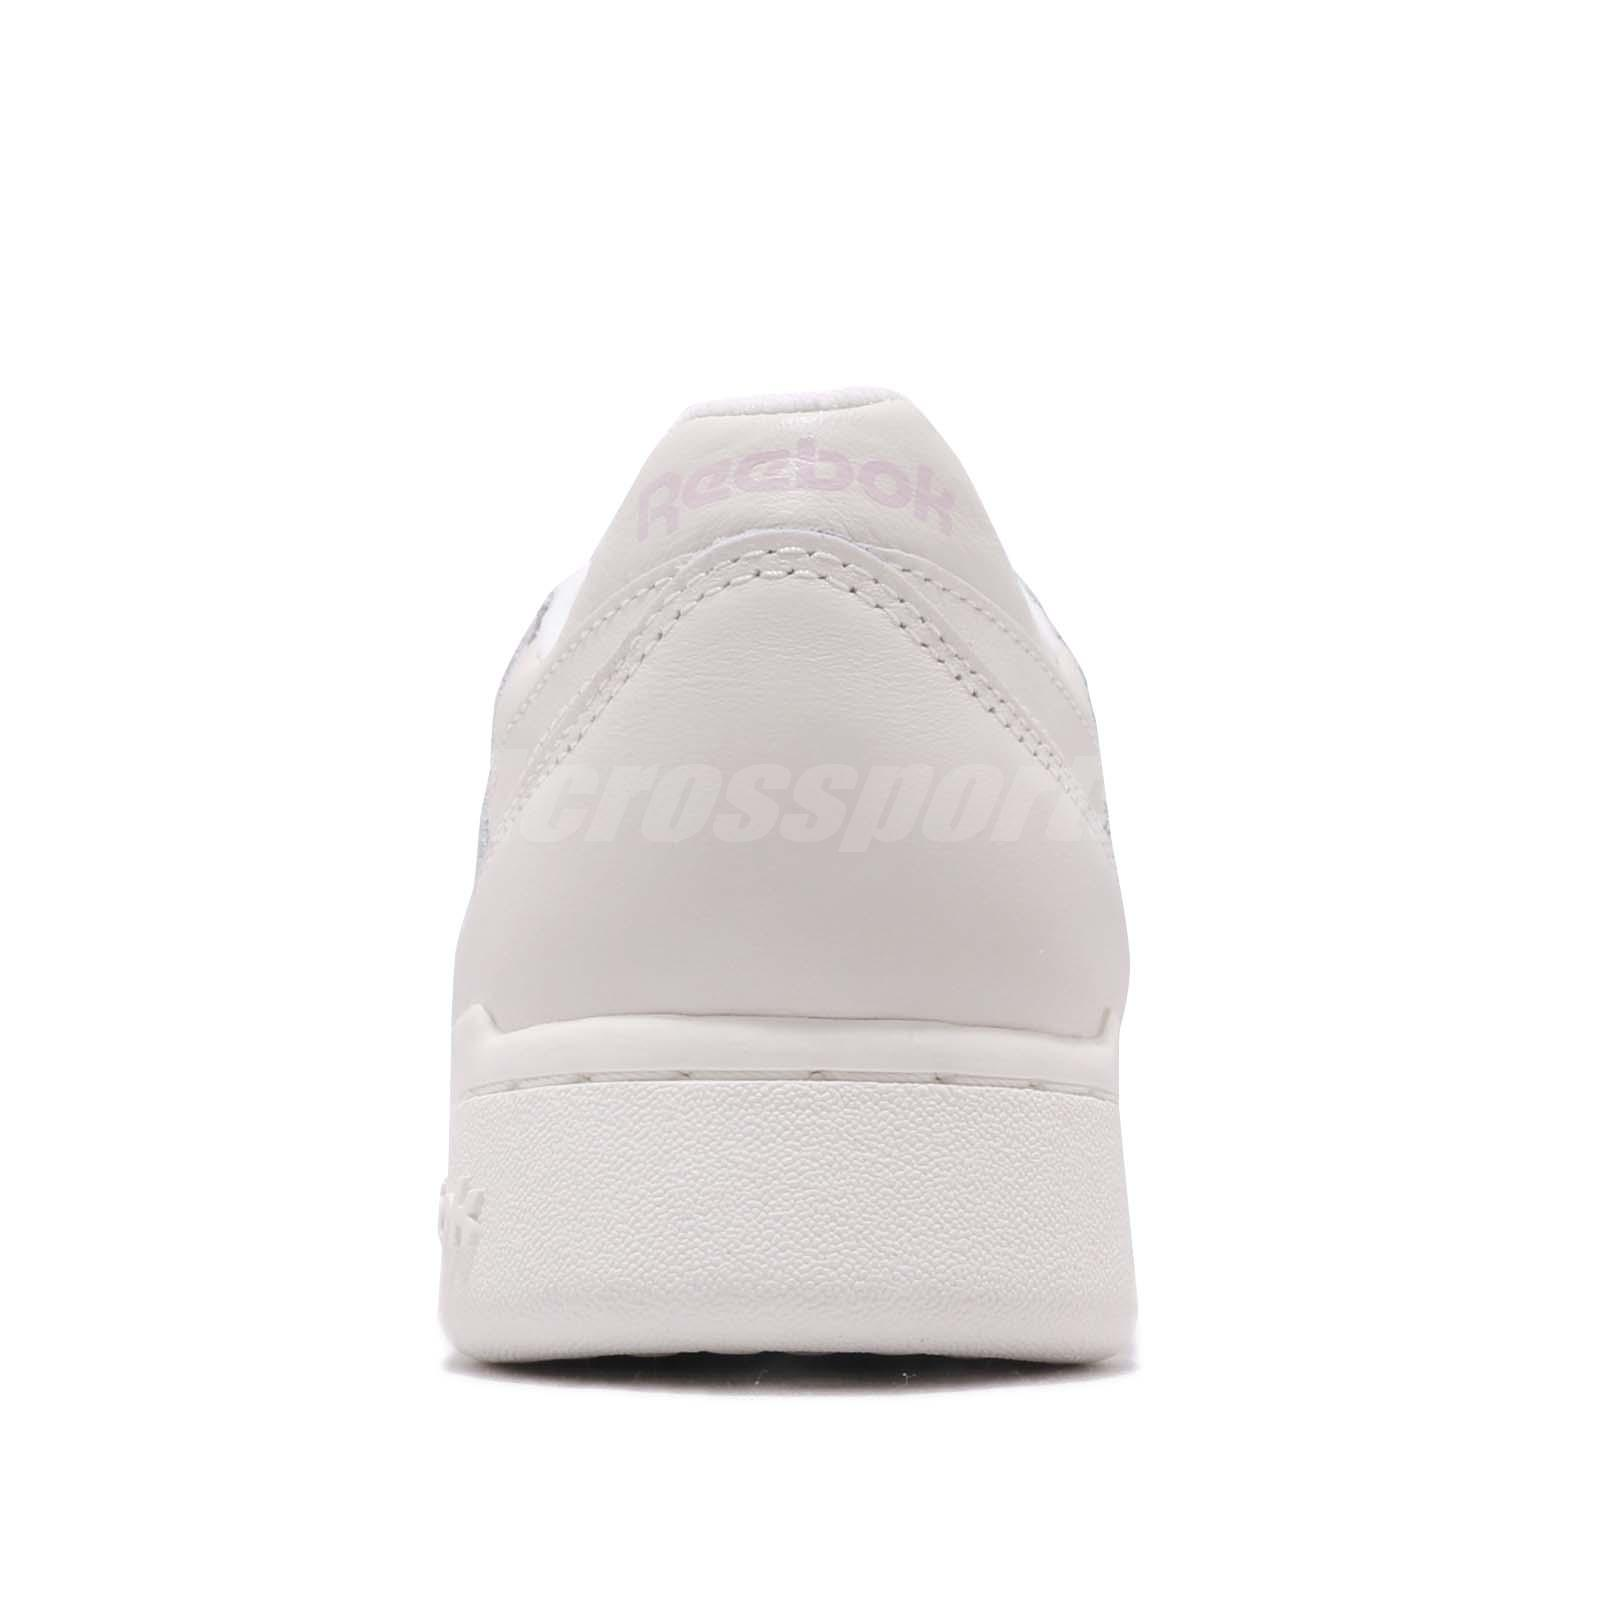 b89d0677544fe Reebok Workout LO Plus White Practical Pink Women Casual Shoes ...